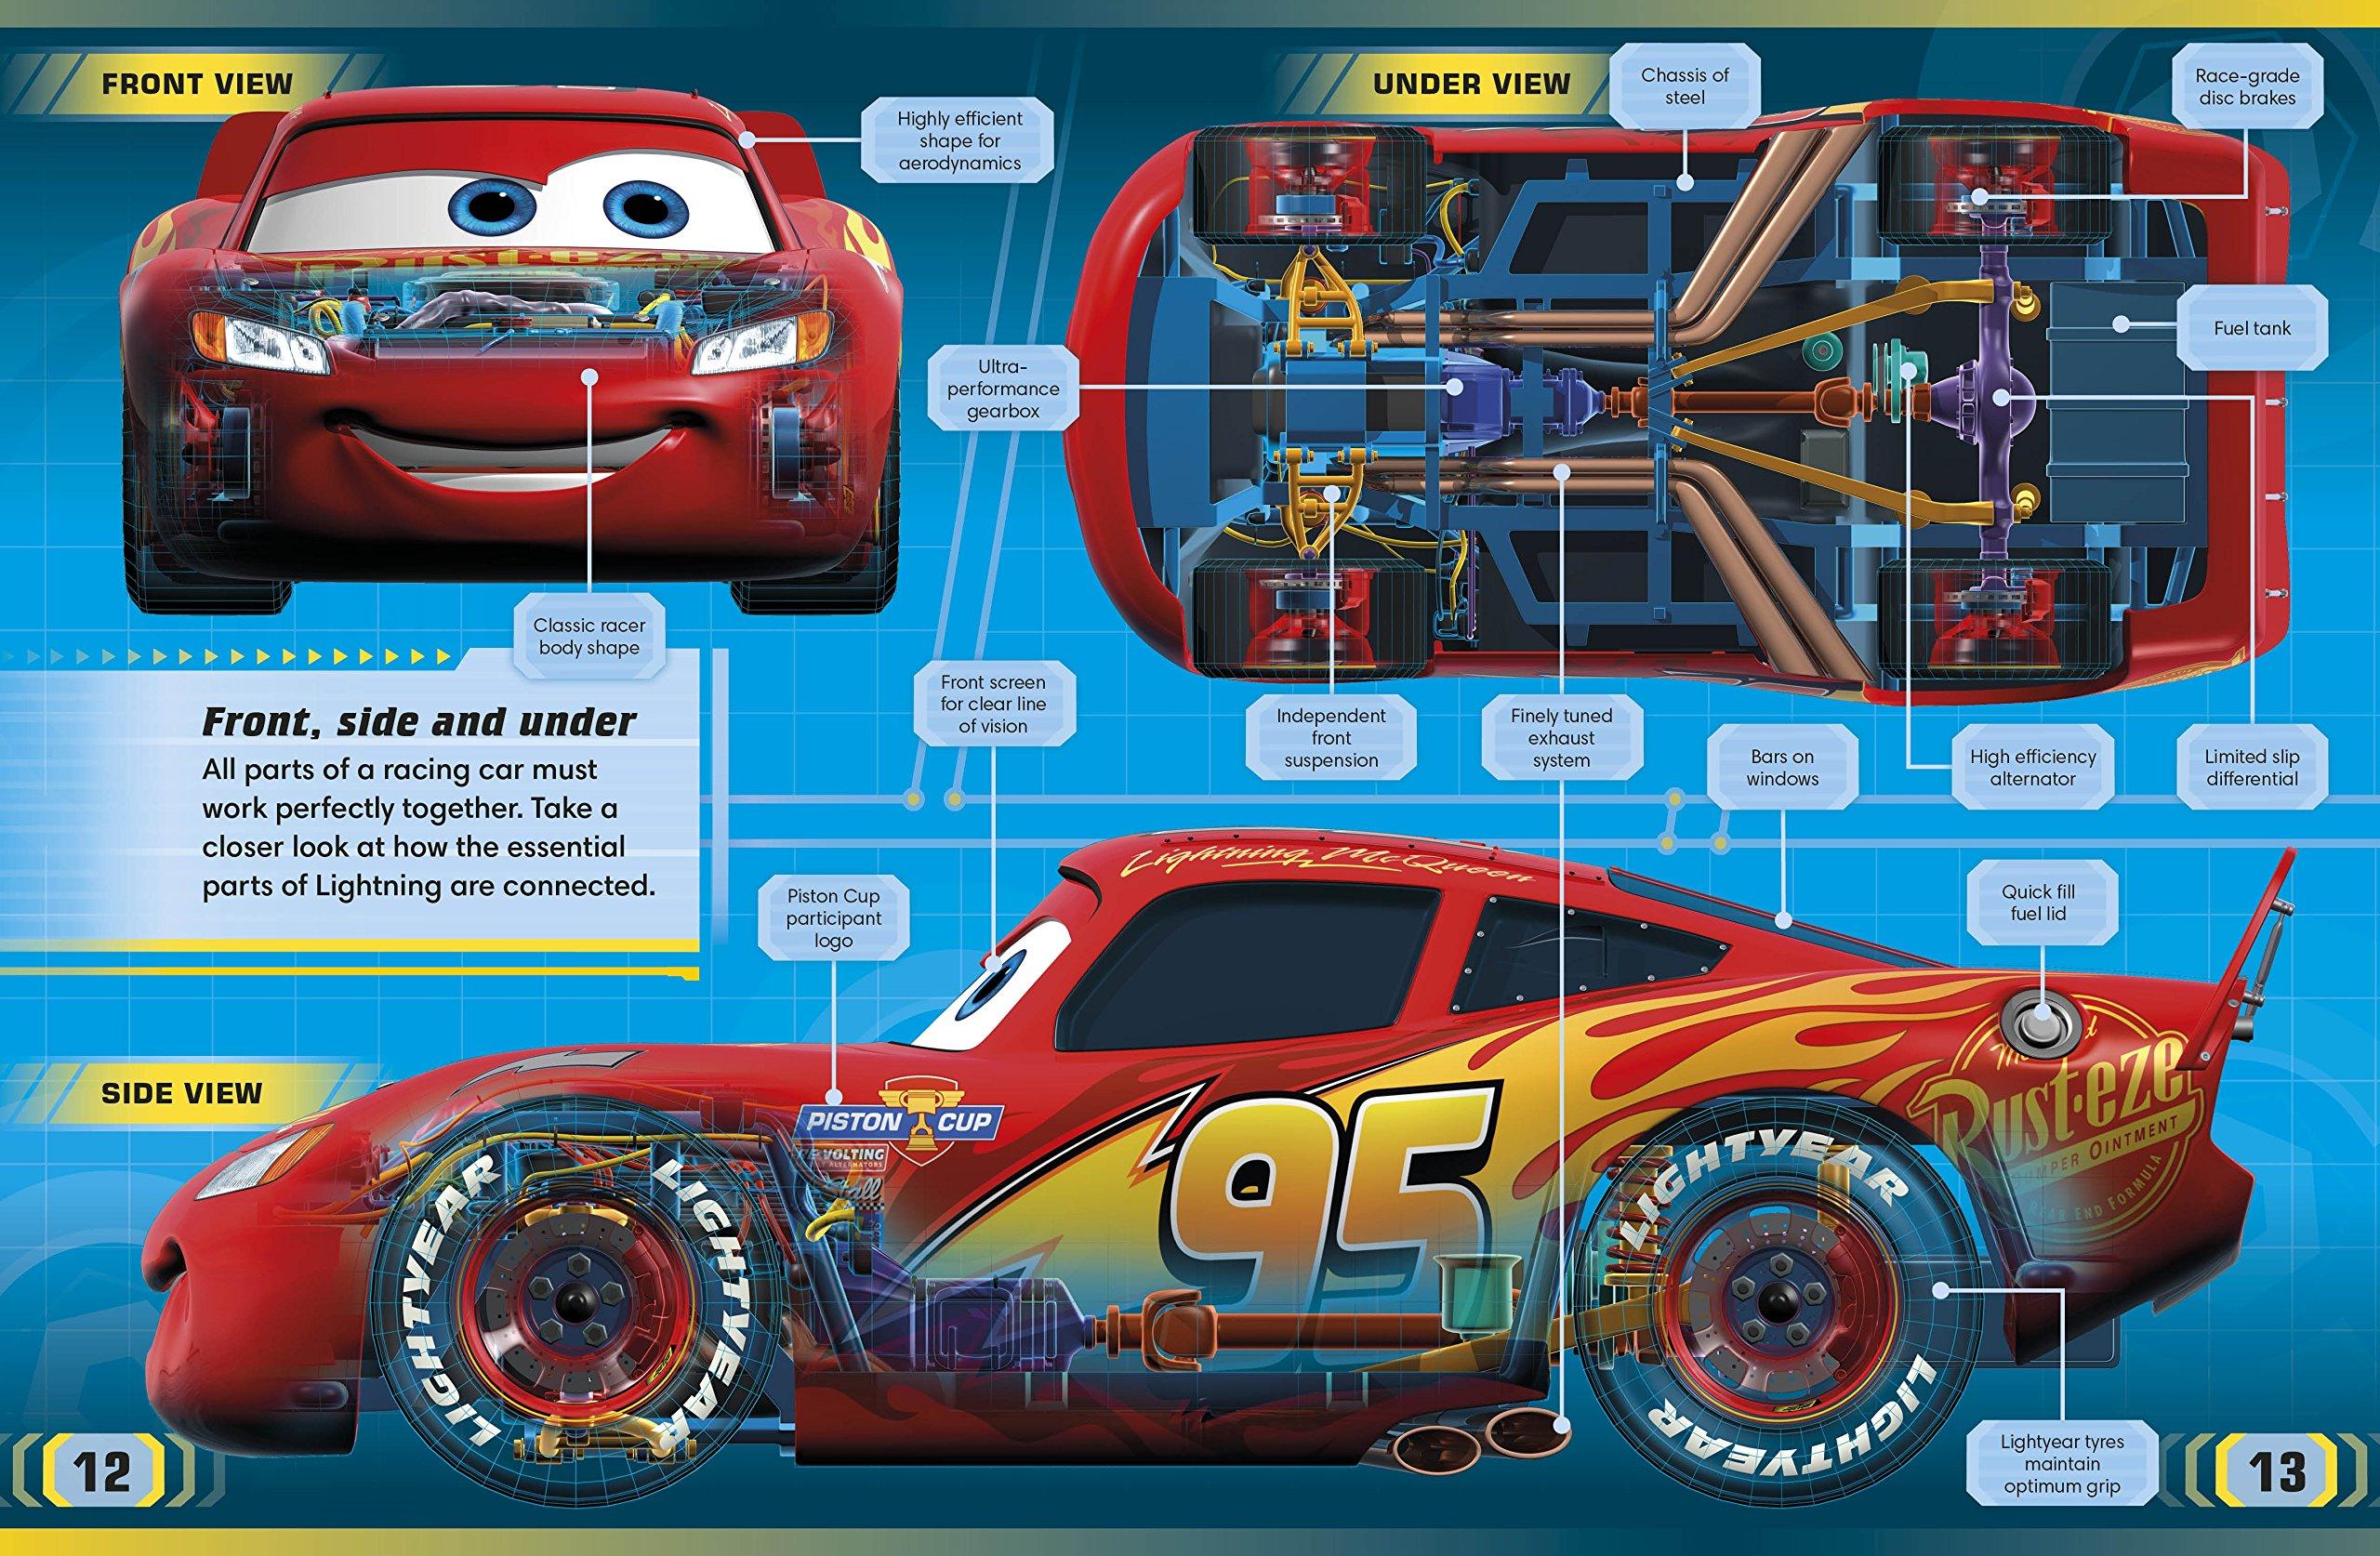 Disney Pixar Cars 3 The Essential Guide: Amazon.de: Steve Bynghall ...